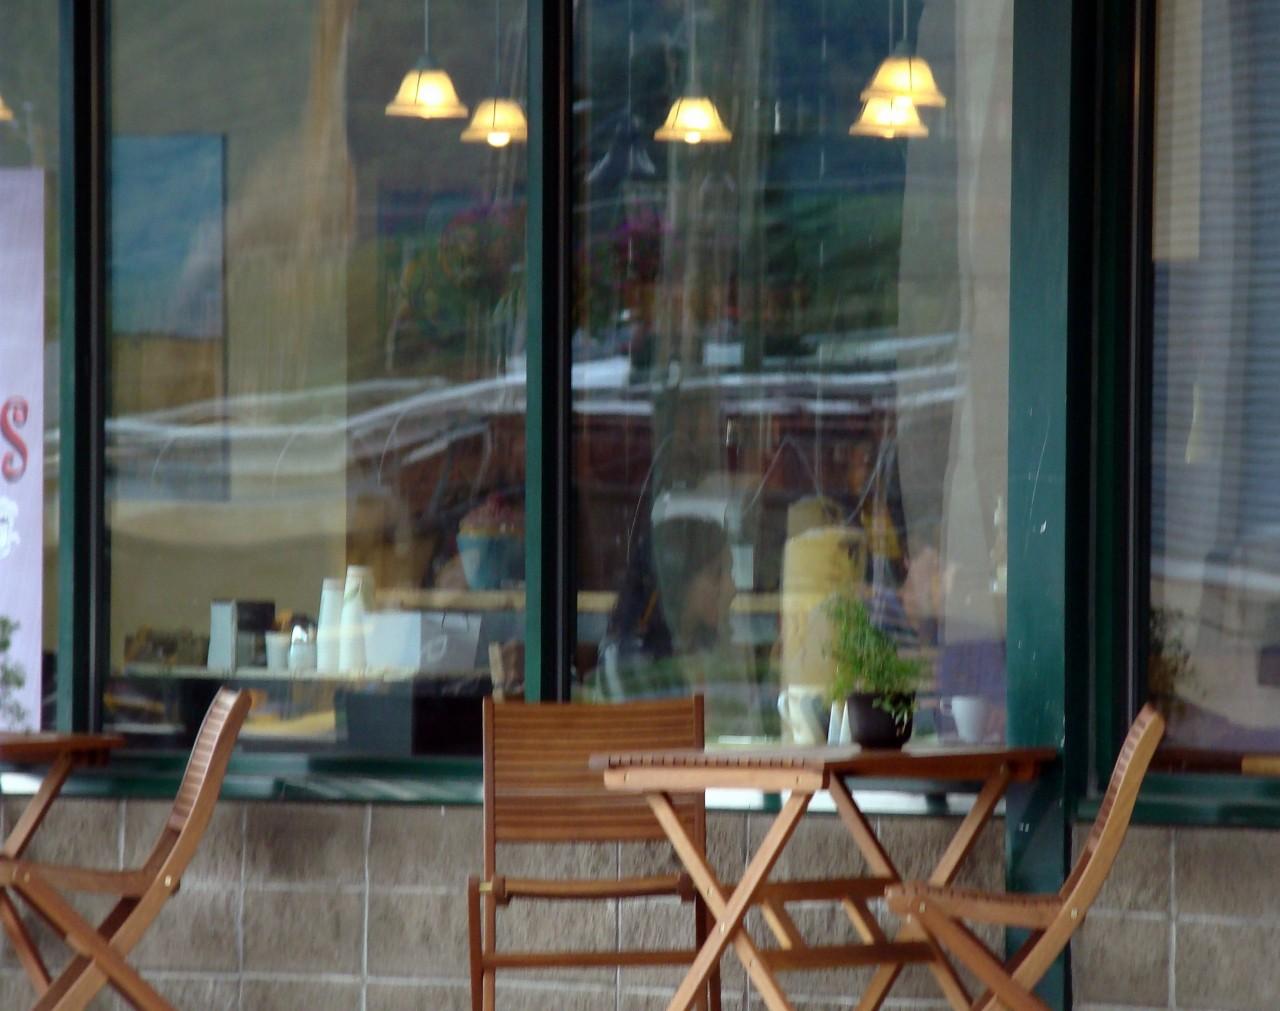 Терраса кафе. Фотограф Сол Лейтер